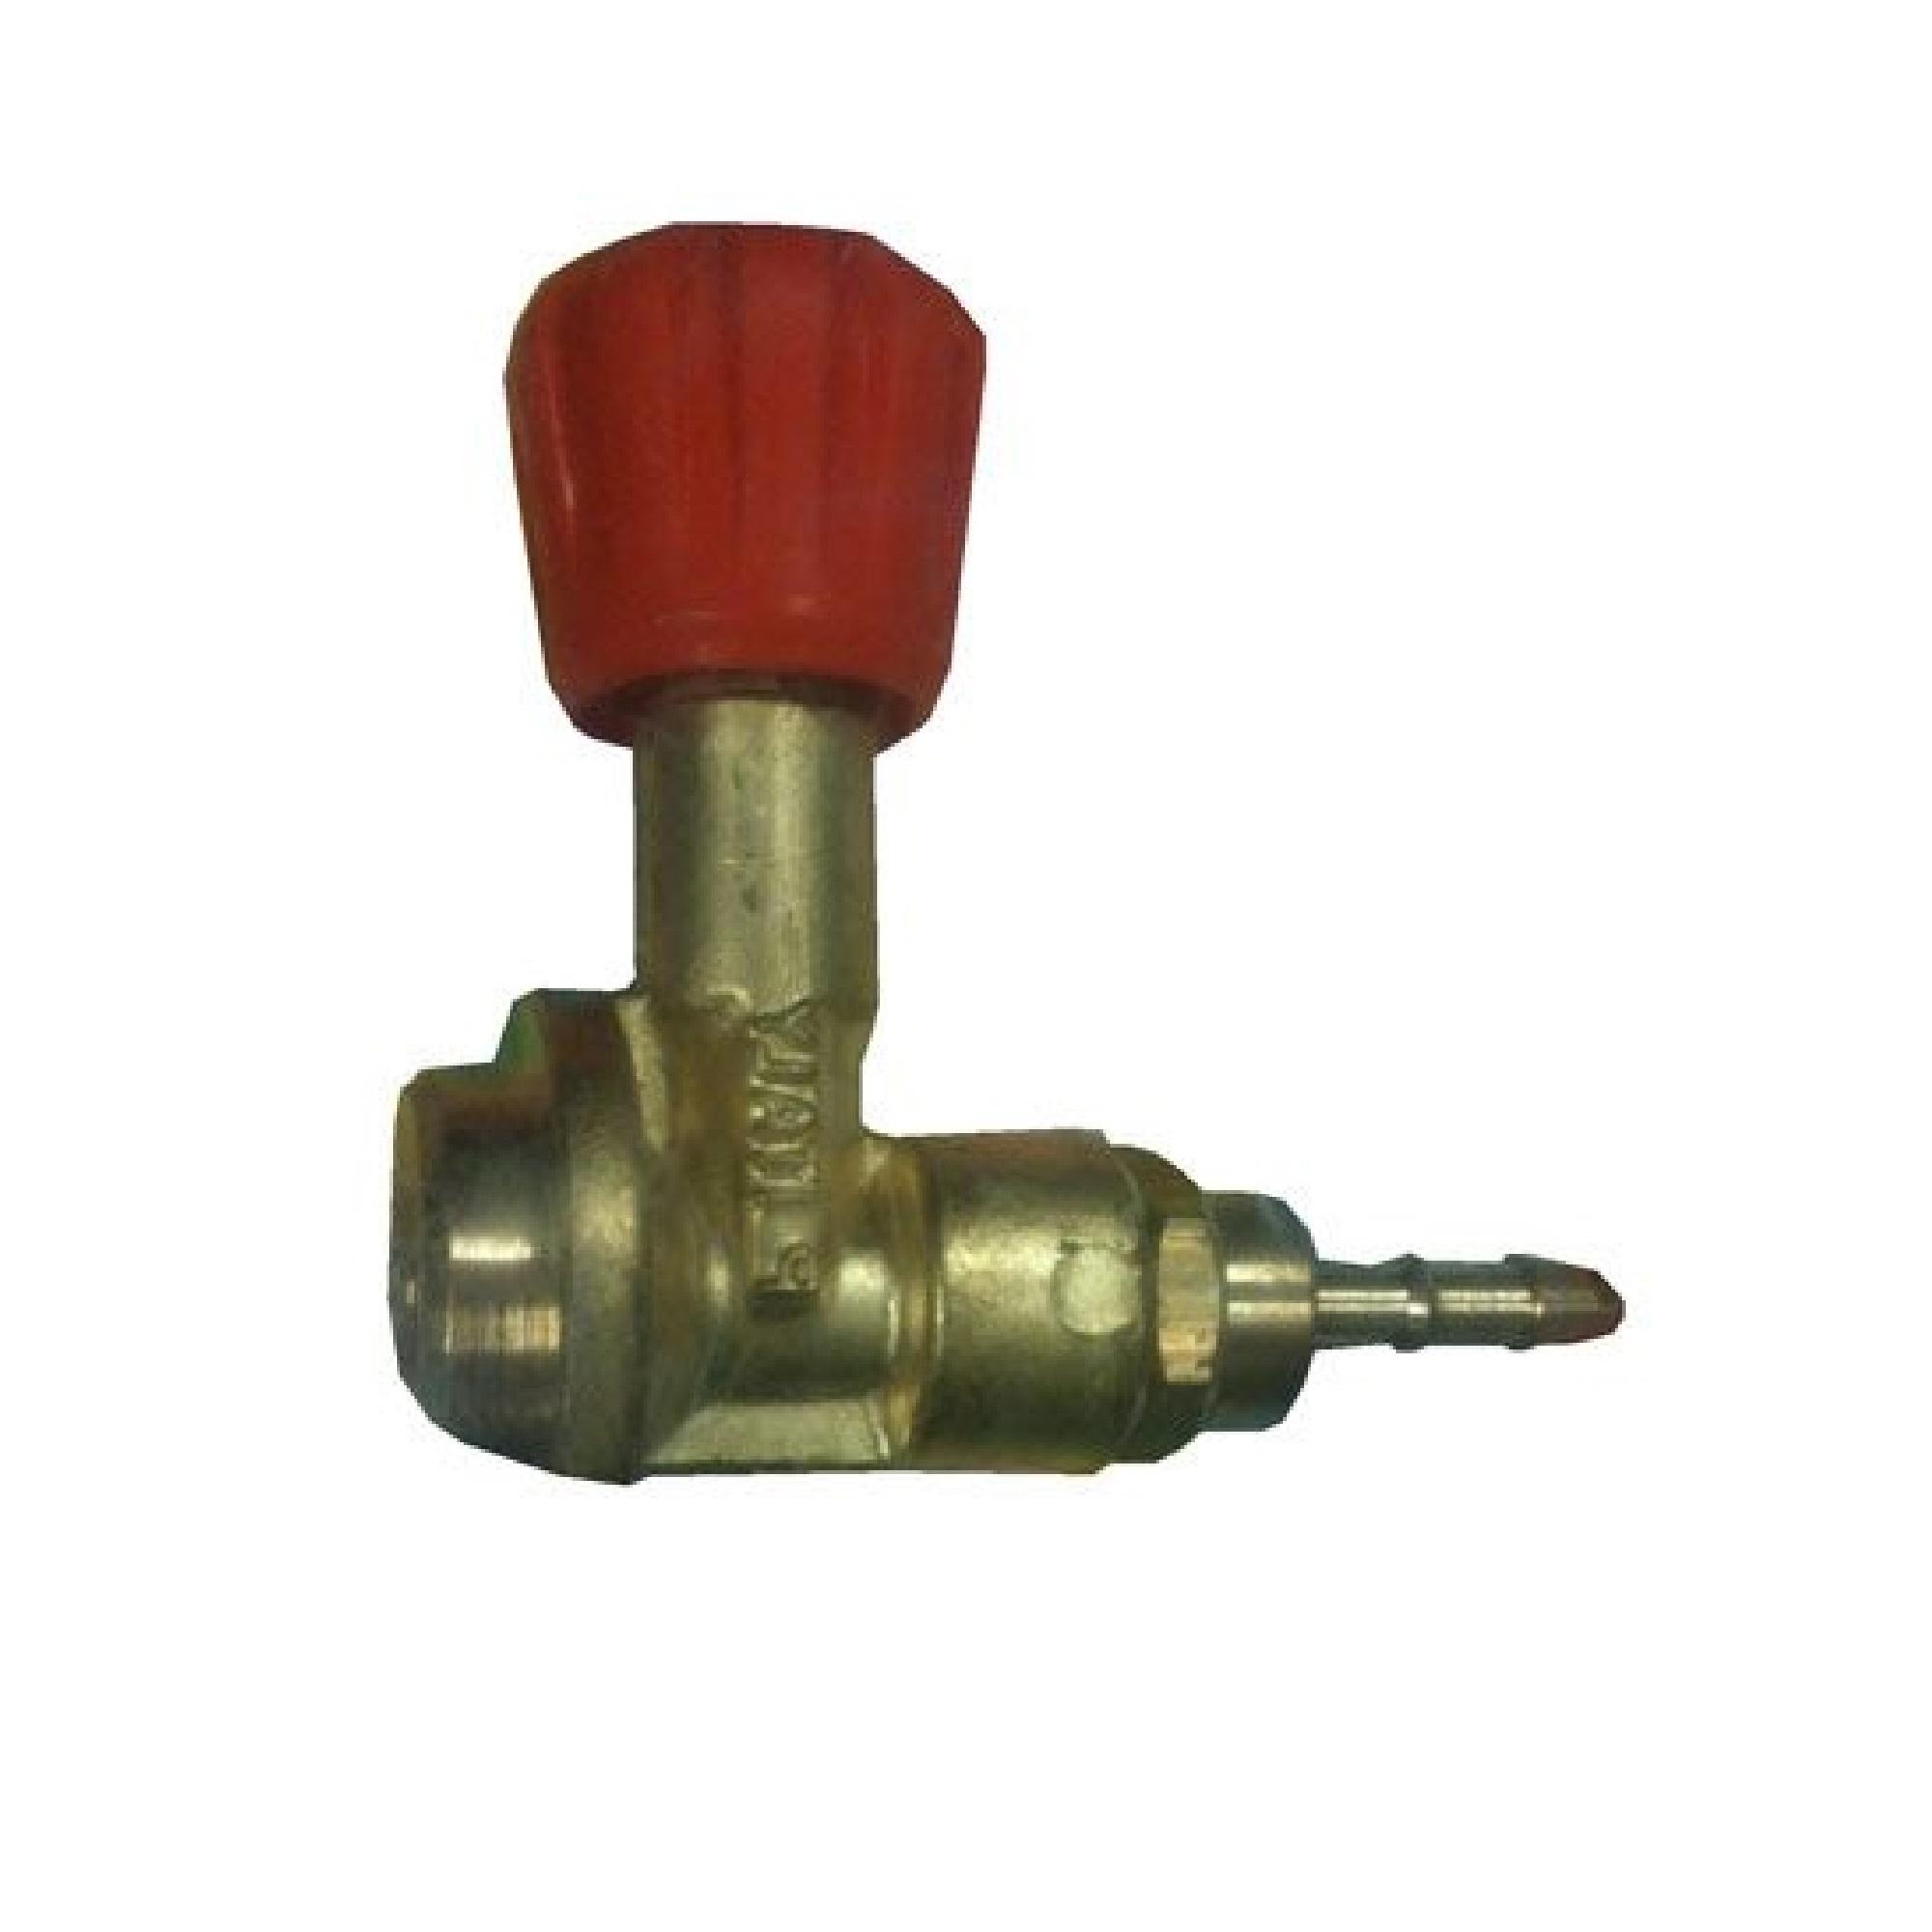 Metal Oxyturbo gas regulator with red knob